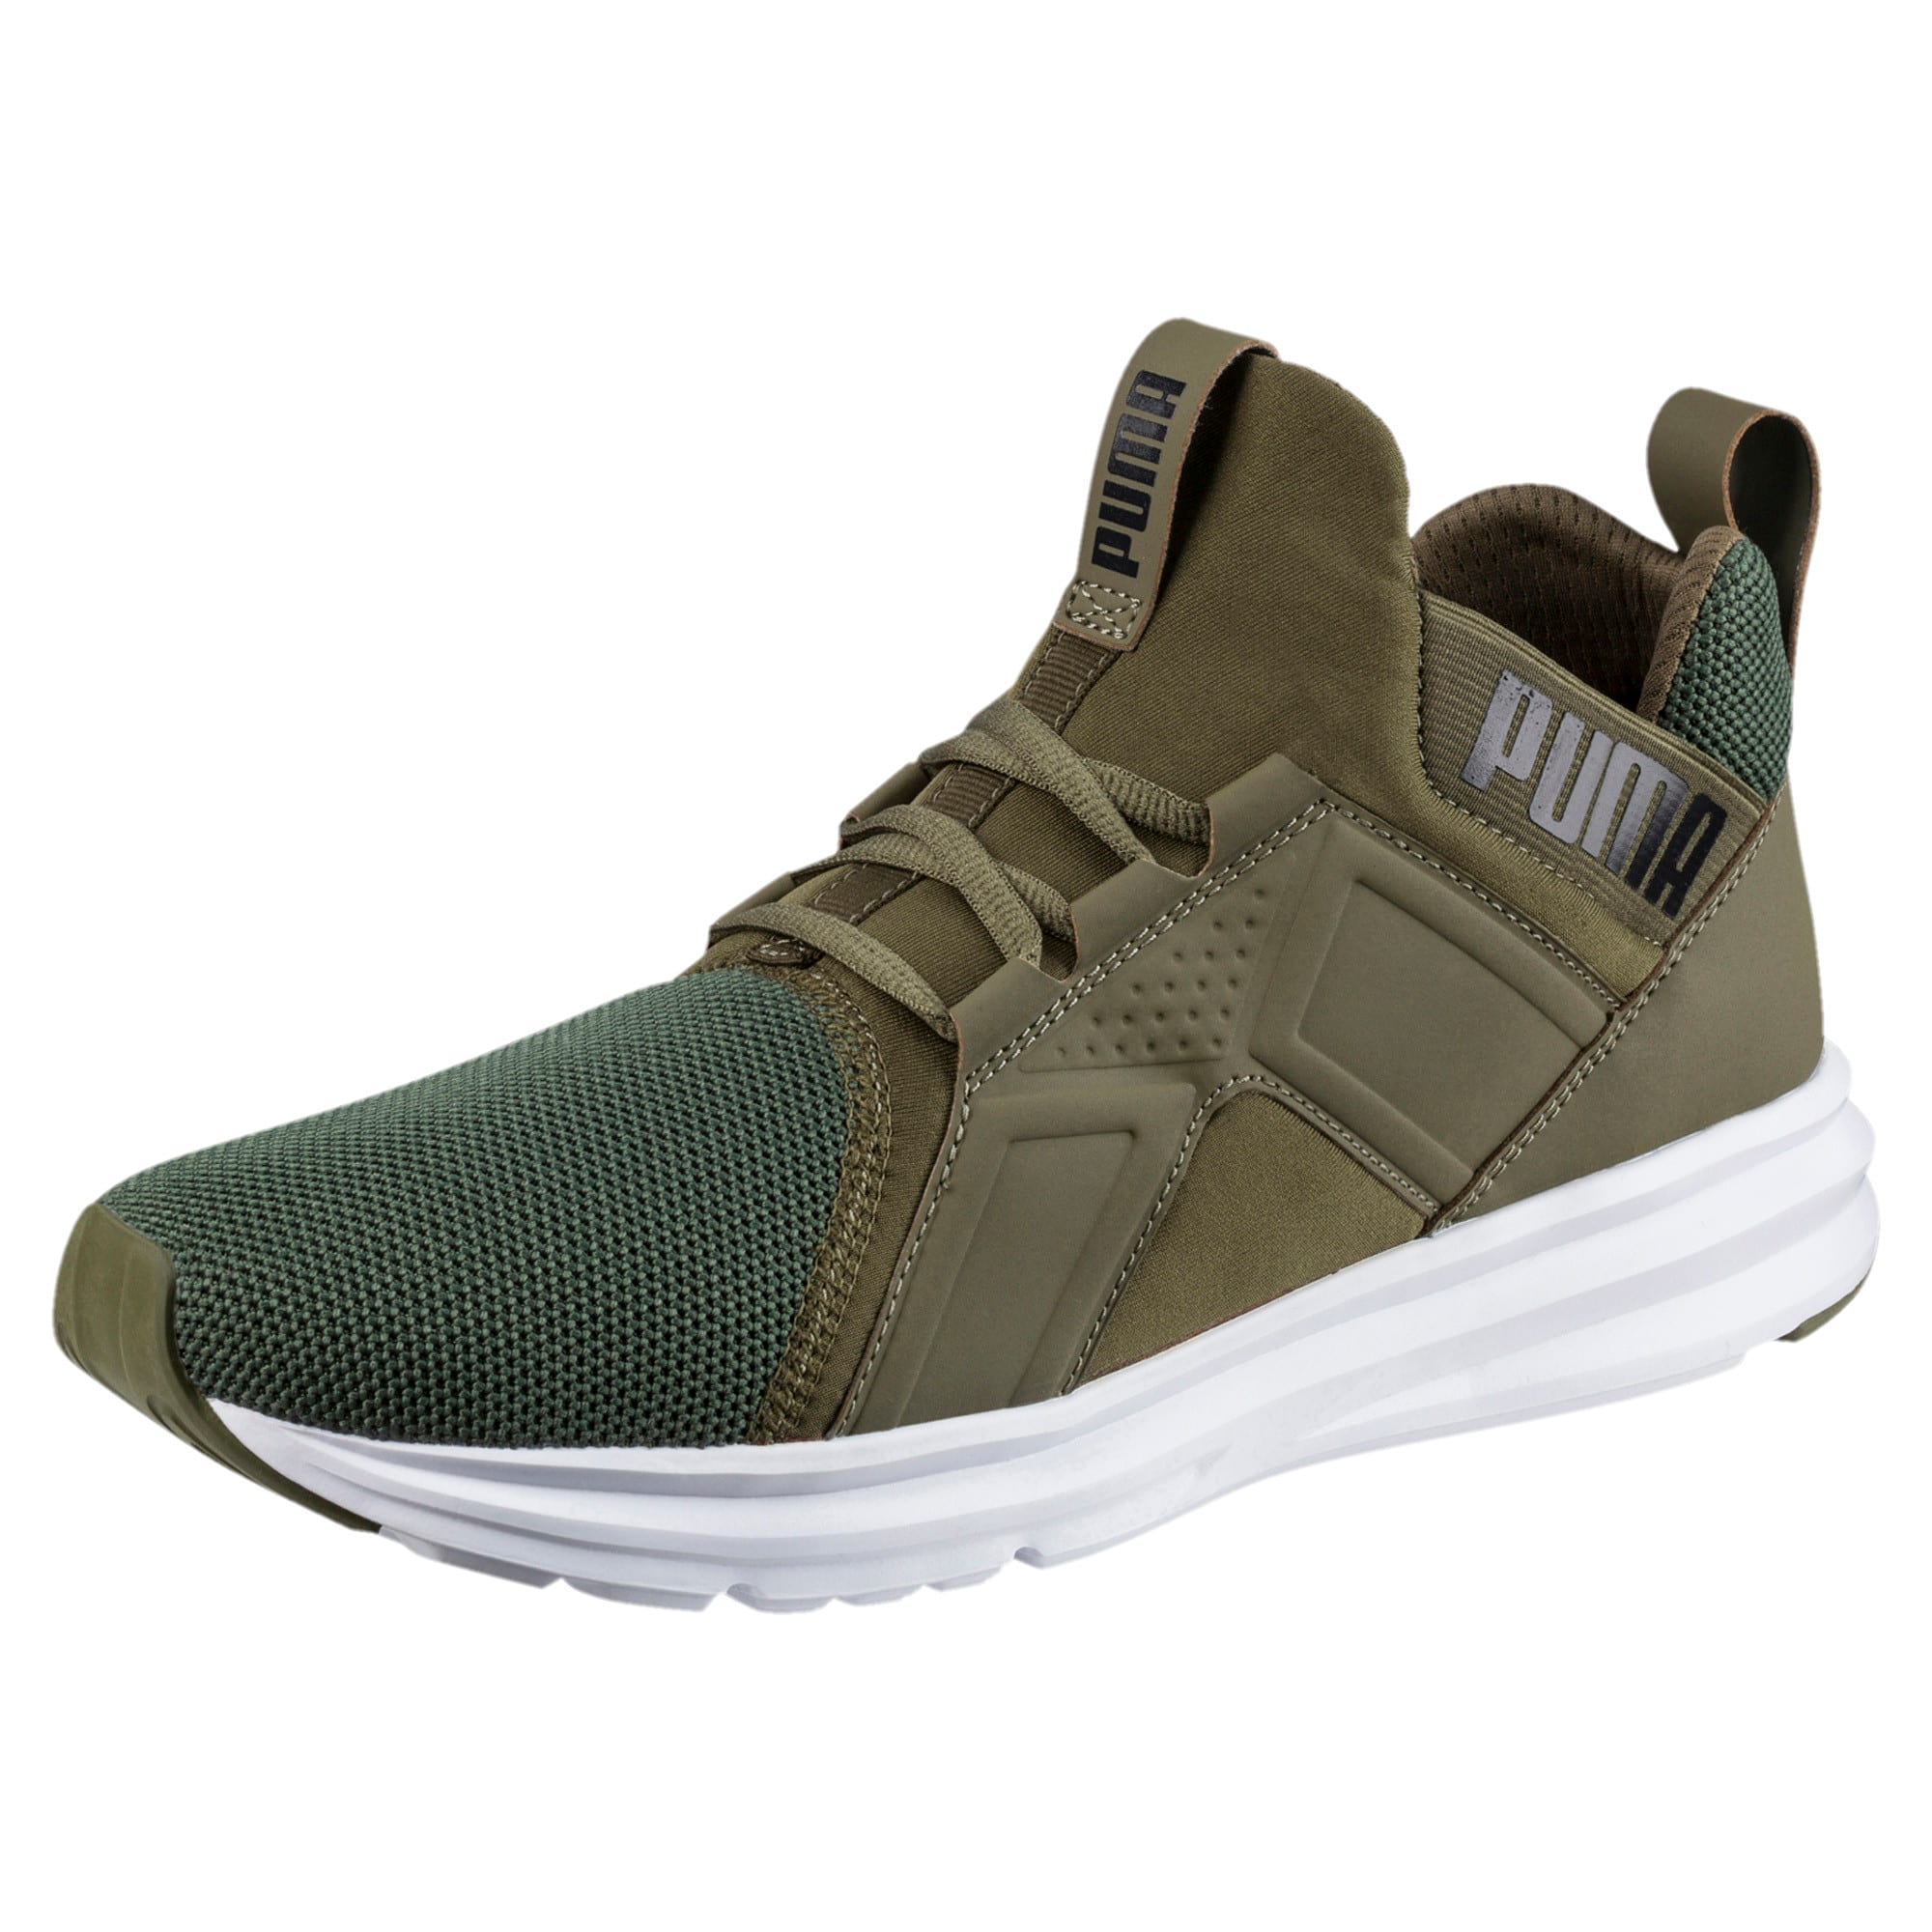 Thumbnail 1 of Enzo Mesh Men's Running Shoes, Olive Night-Puma White, medium-IND